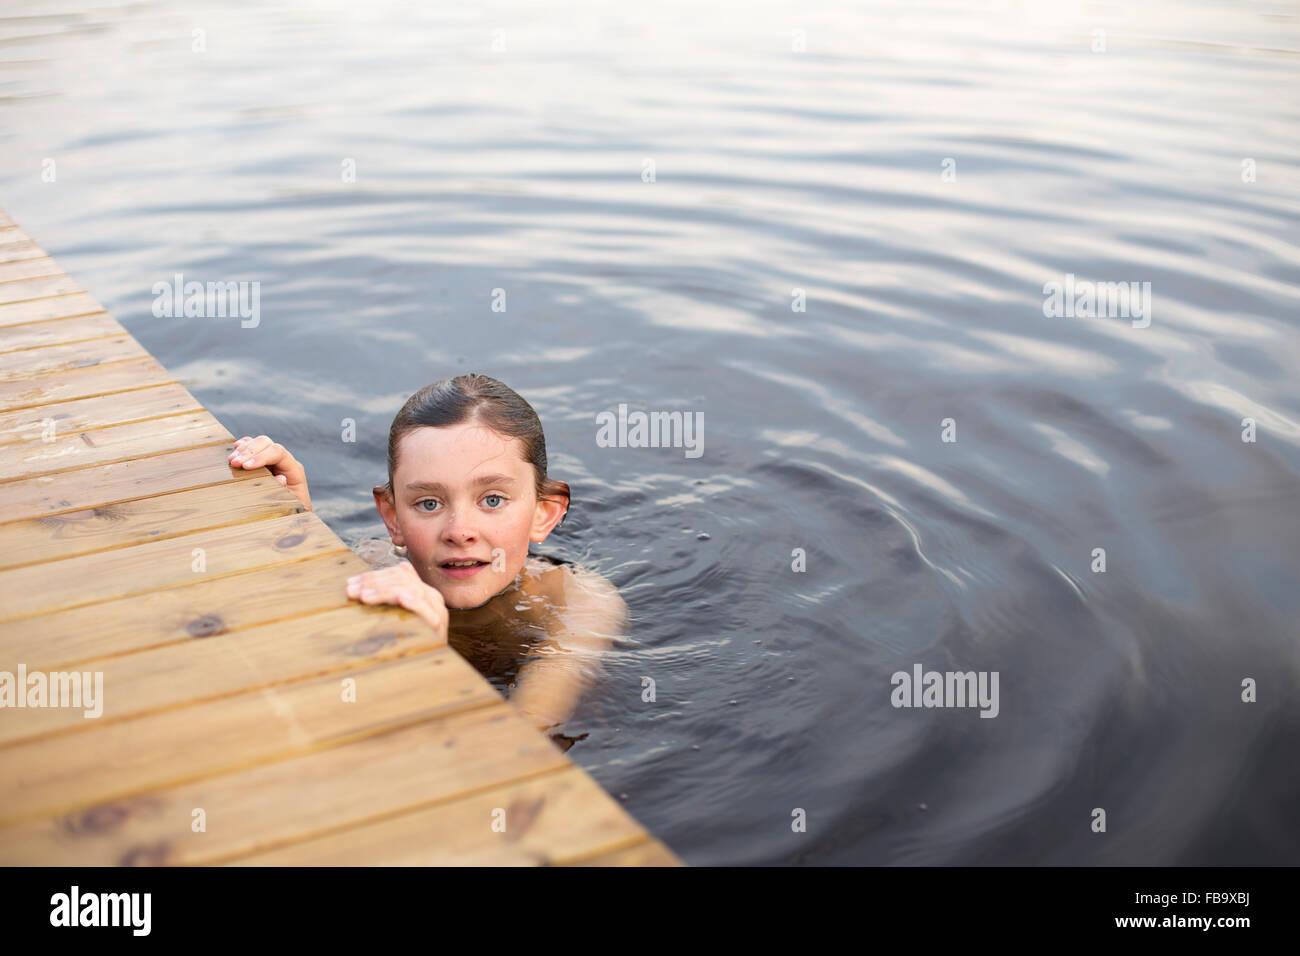 Schweden, Smaland, Braarpasjon, Portrait eines jungen (12-13) im See berühren Holzsteg Stockbild